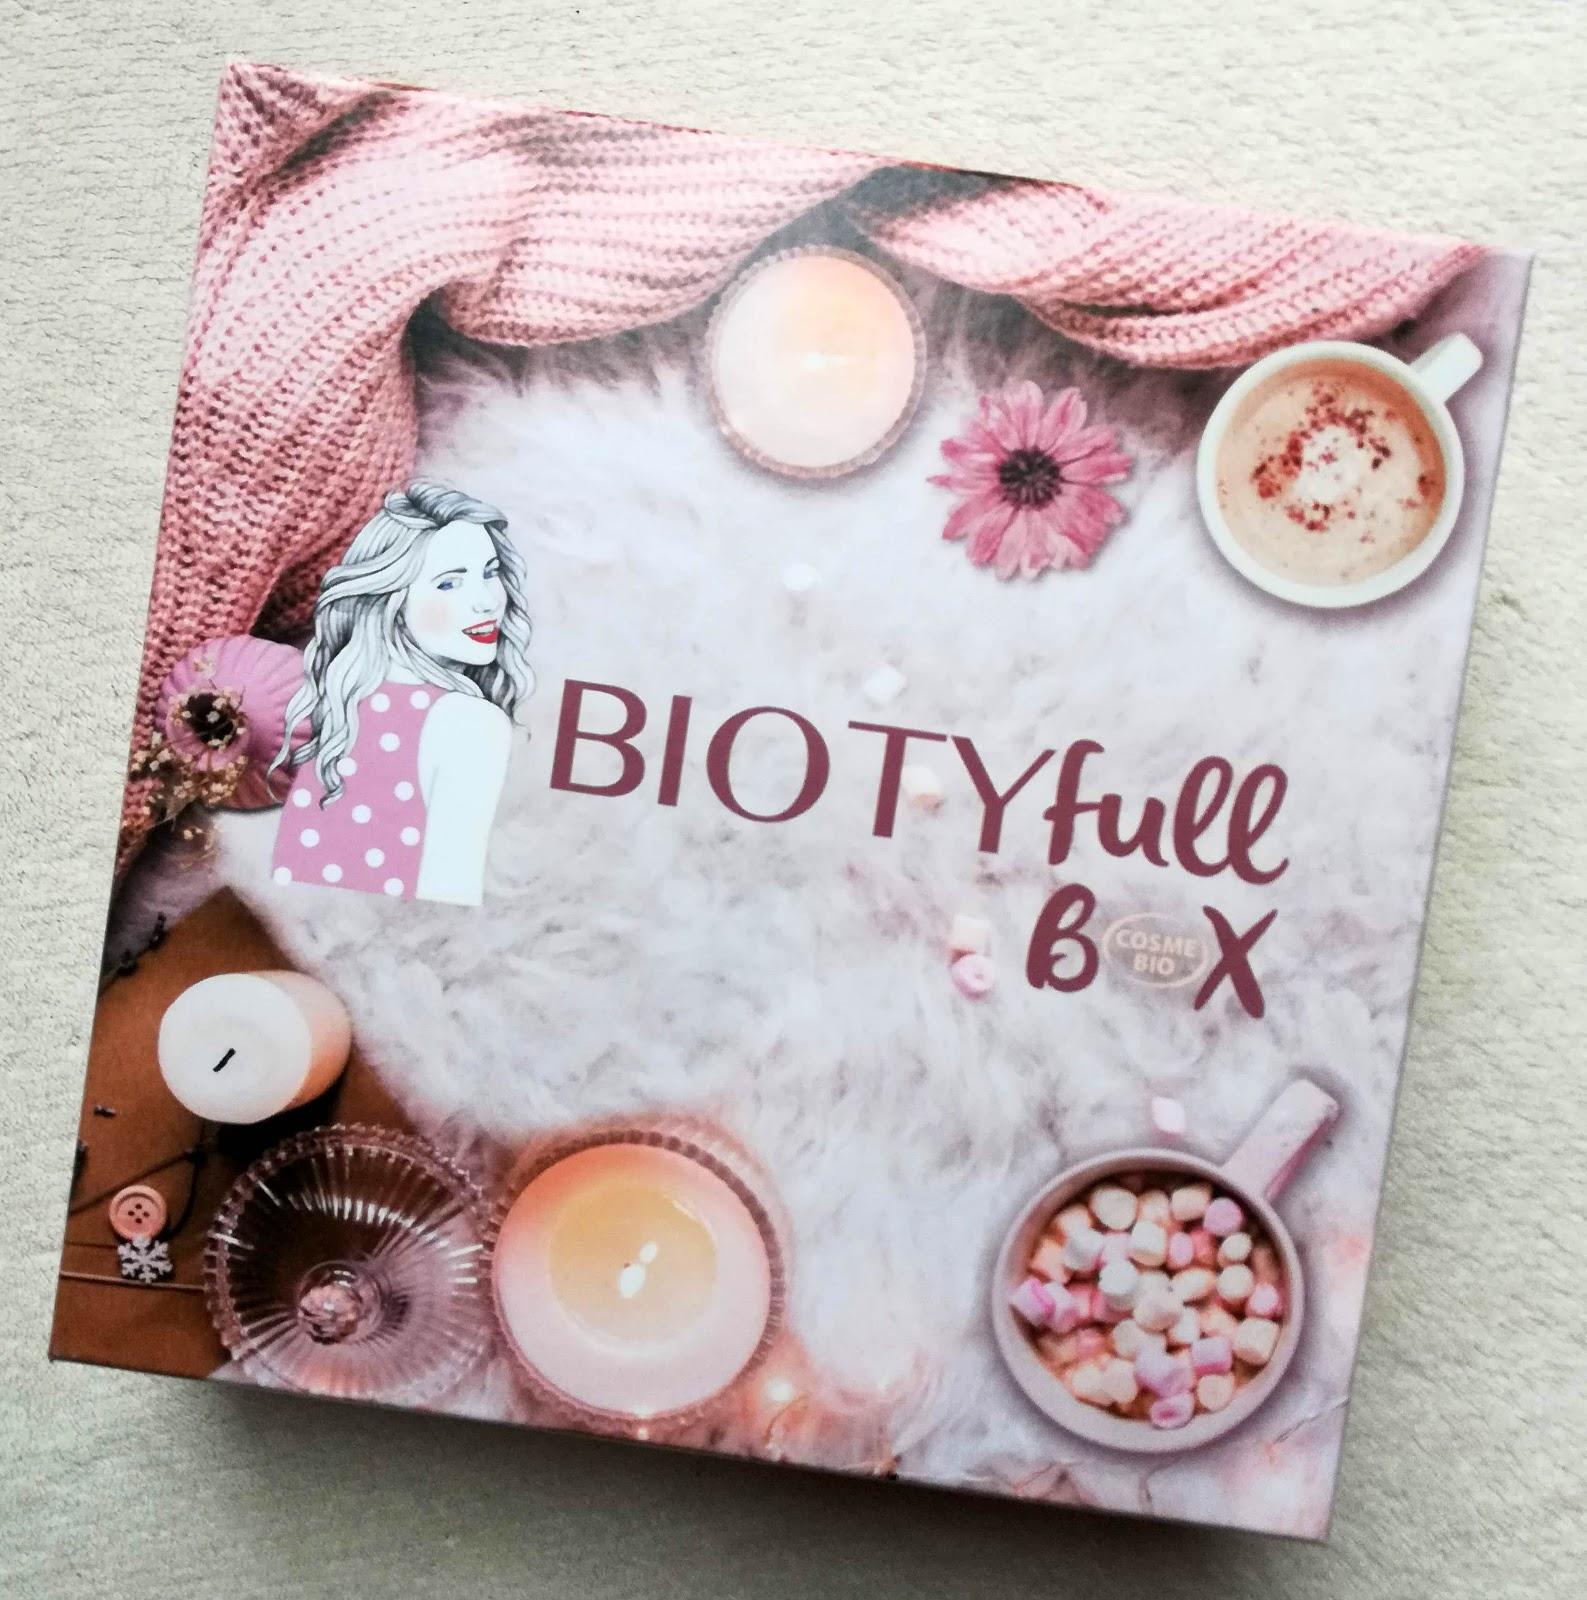 BIOTYFULL BOX Novembre 2019 : La cocooning parfumée